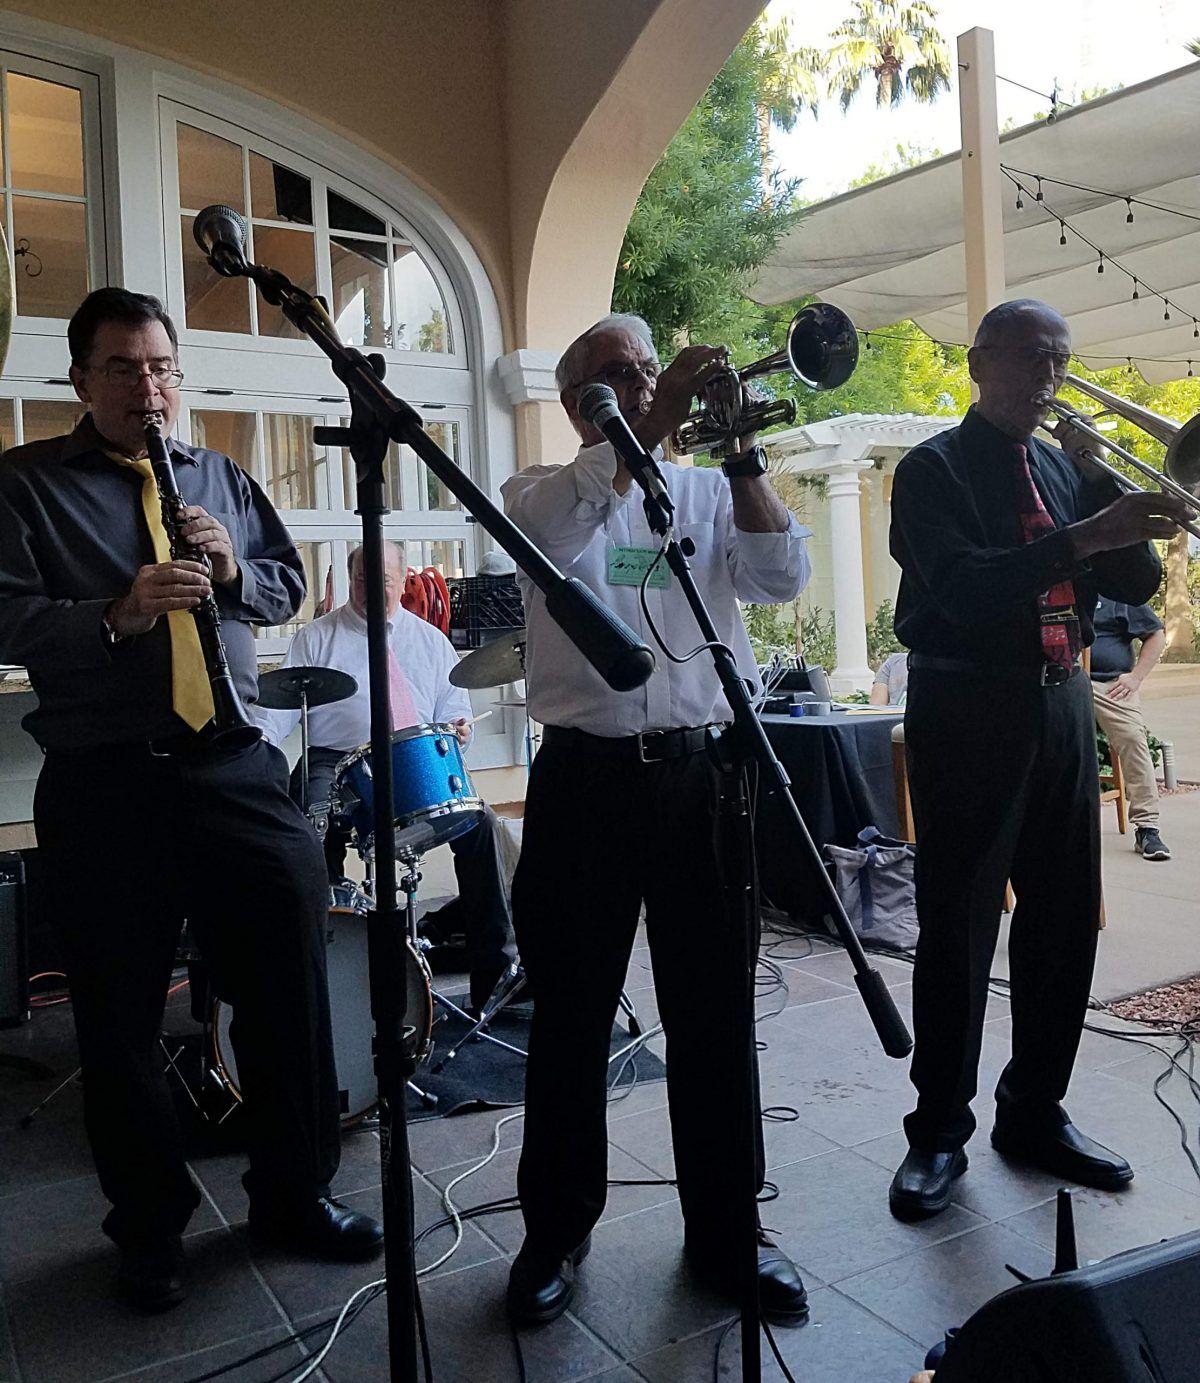 QuarterNotesPhotoJAN20 6Patio scaled e1577490004405 - From The 30th Annual Arizona Classic Jazz Festival